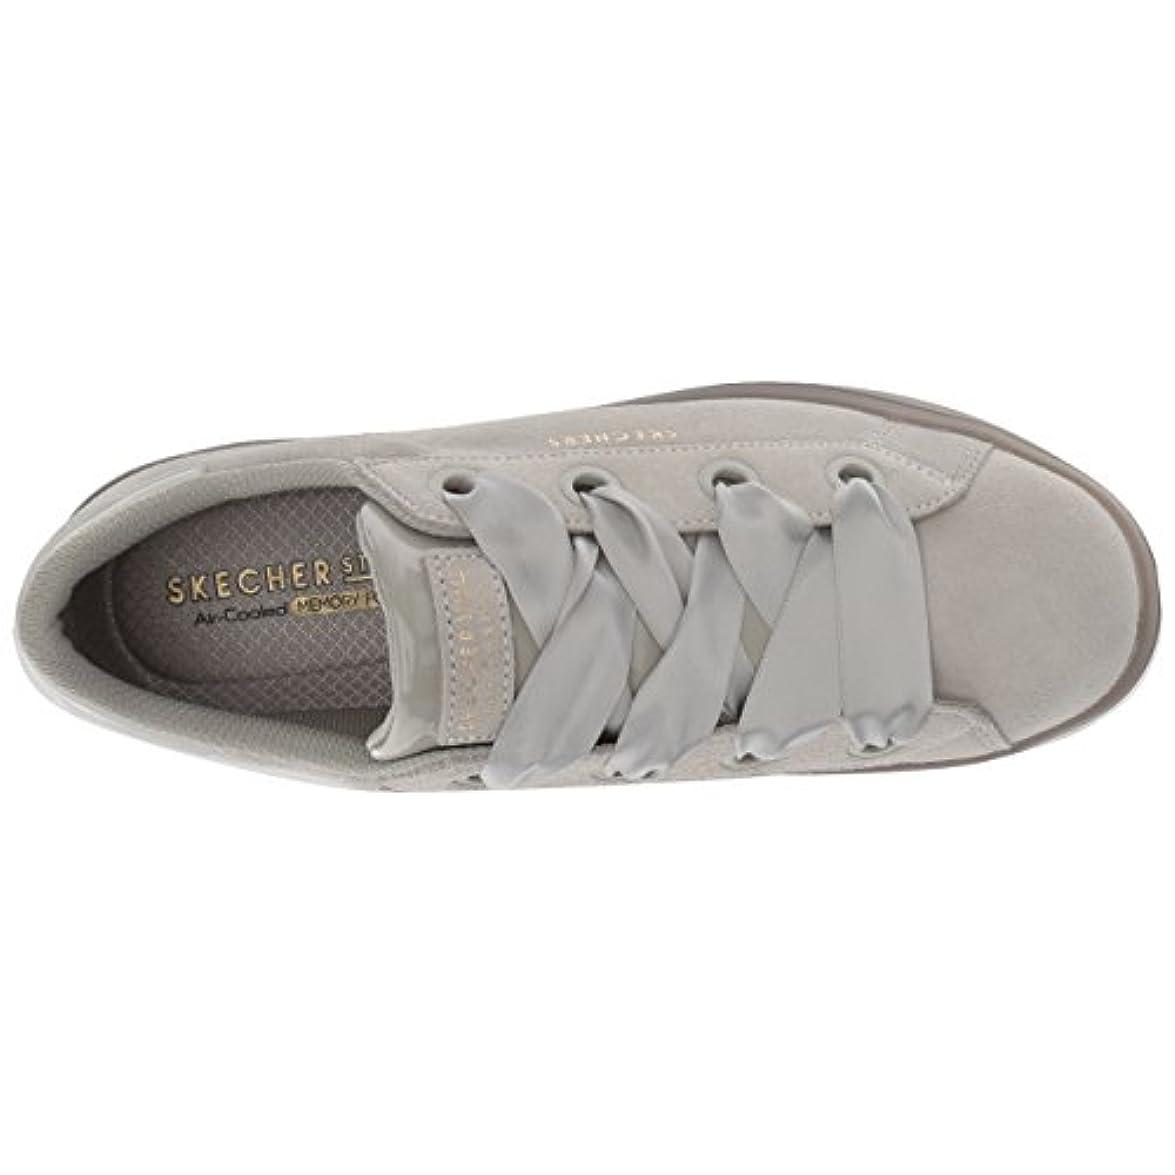 Skechers Street Women's 977 Sneaker Donna Grigio gray 38 B m Eu